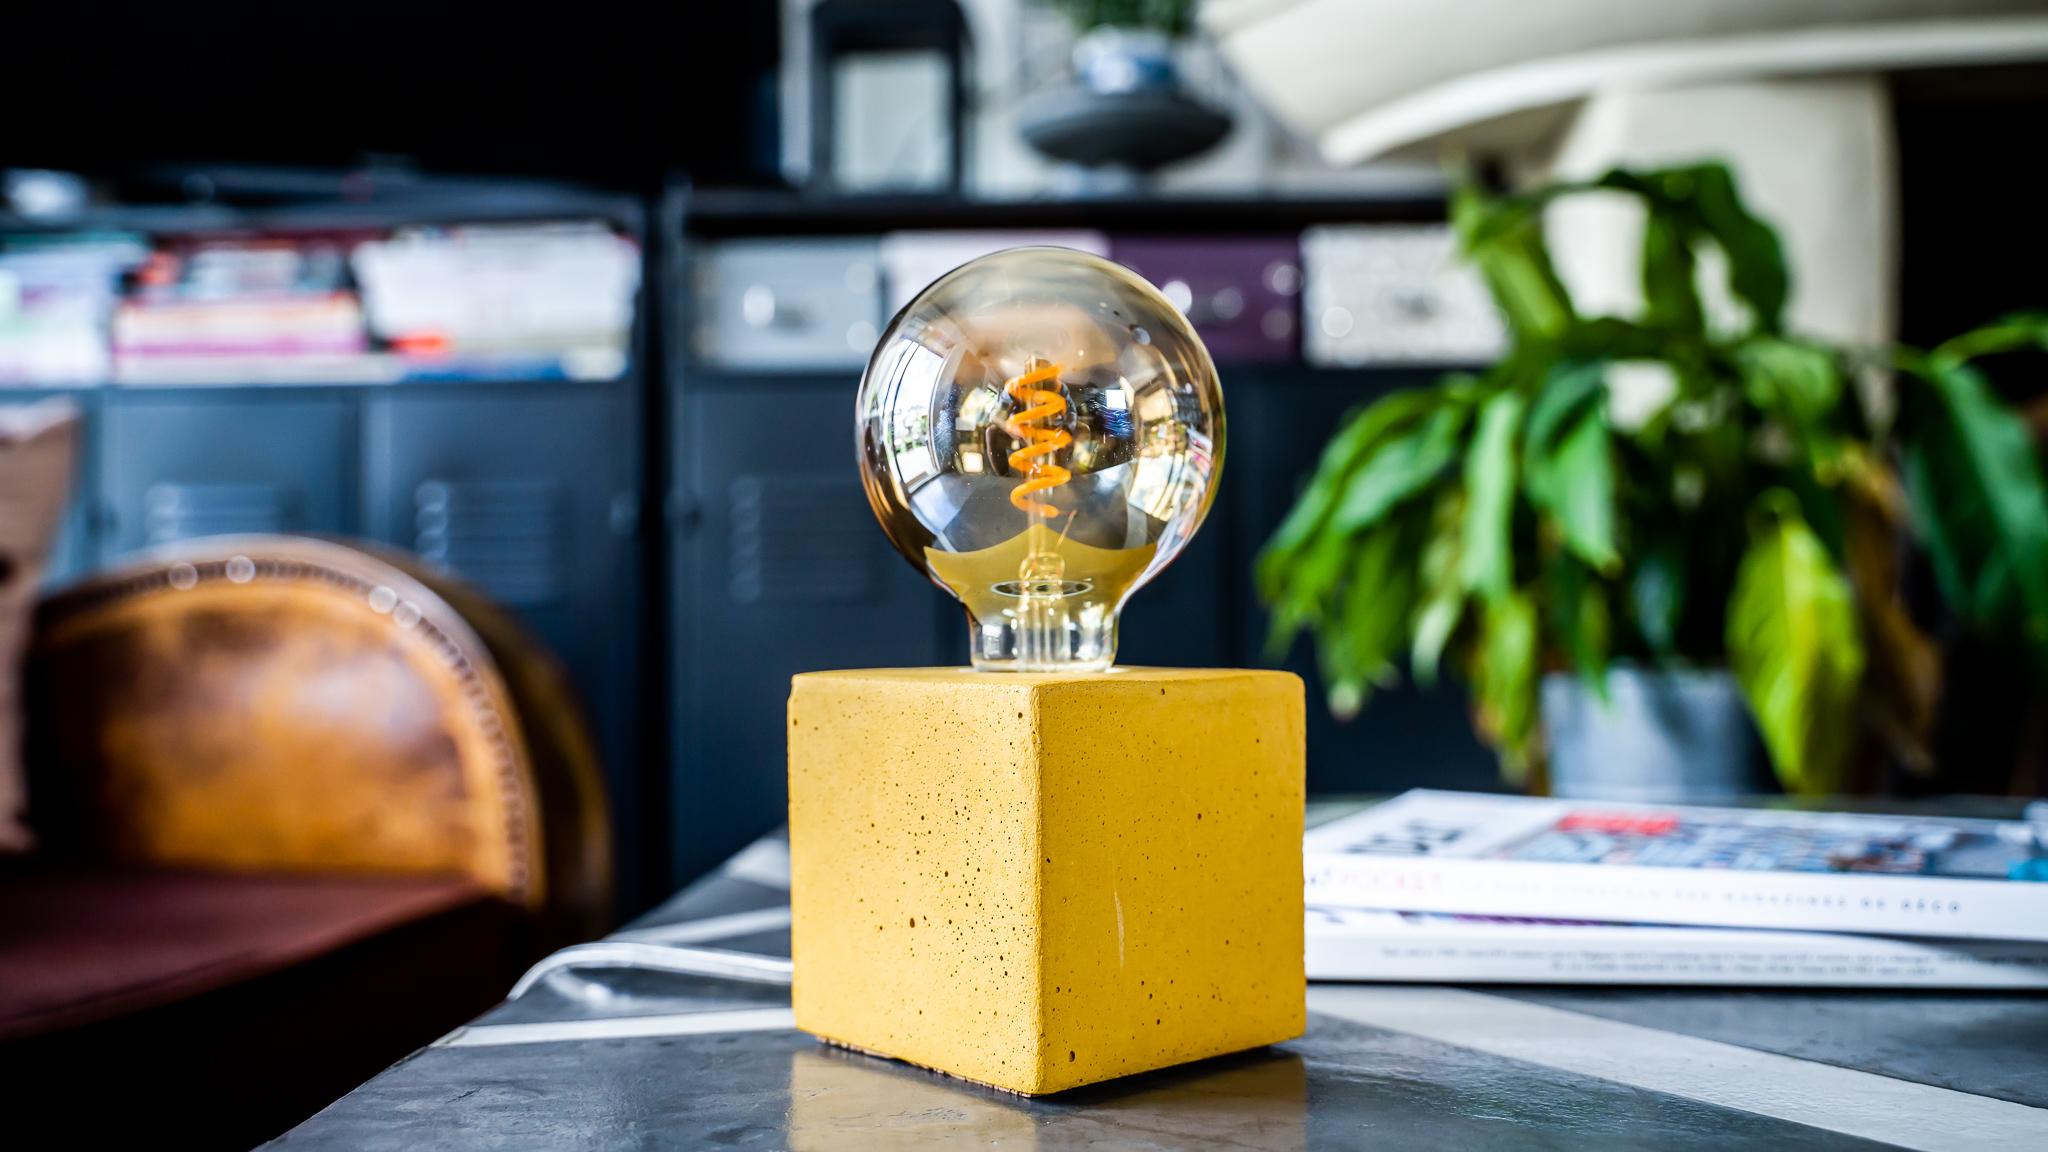 Lampe cube en béton jaune moutarde fabrication artisanale